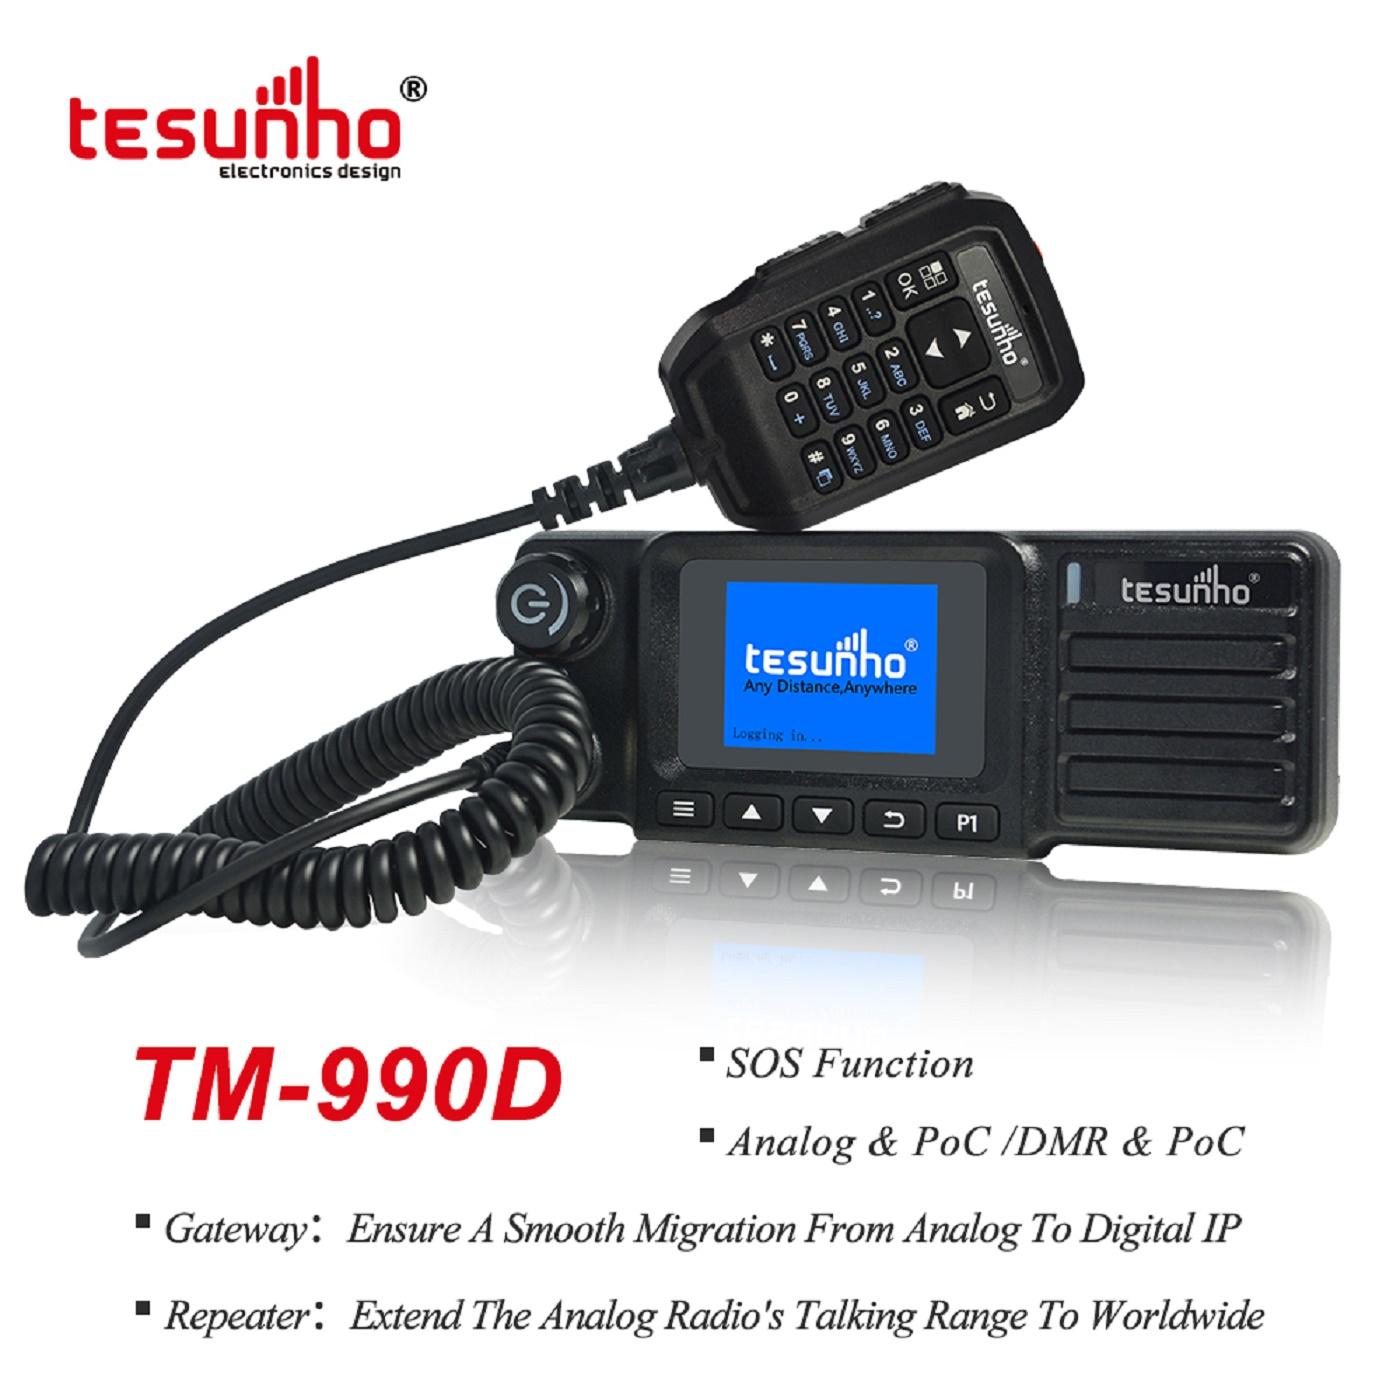 Repeater 4G Analog Mobile Radio TM-990D